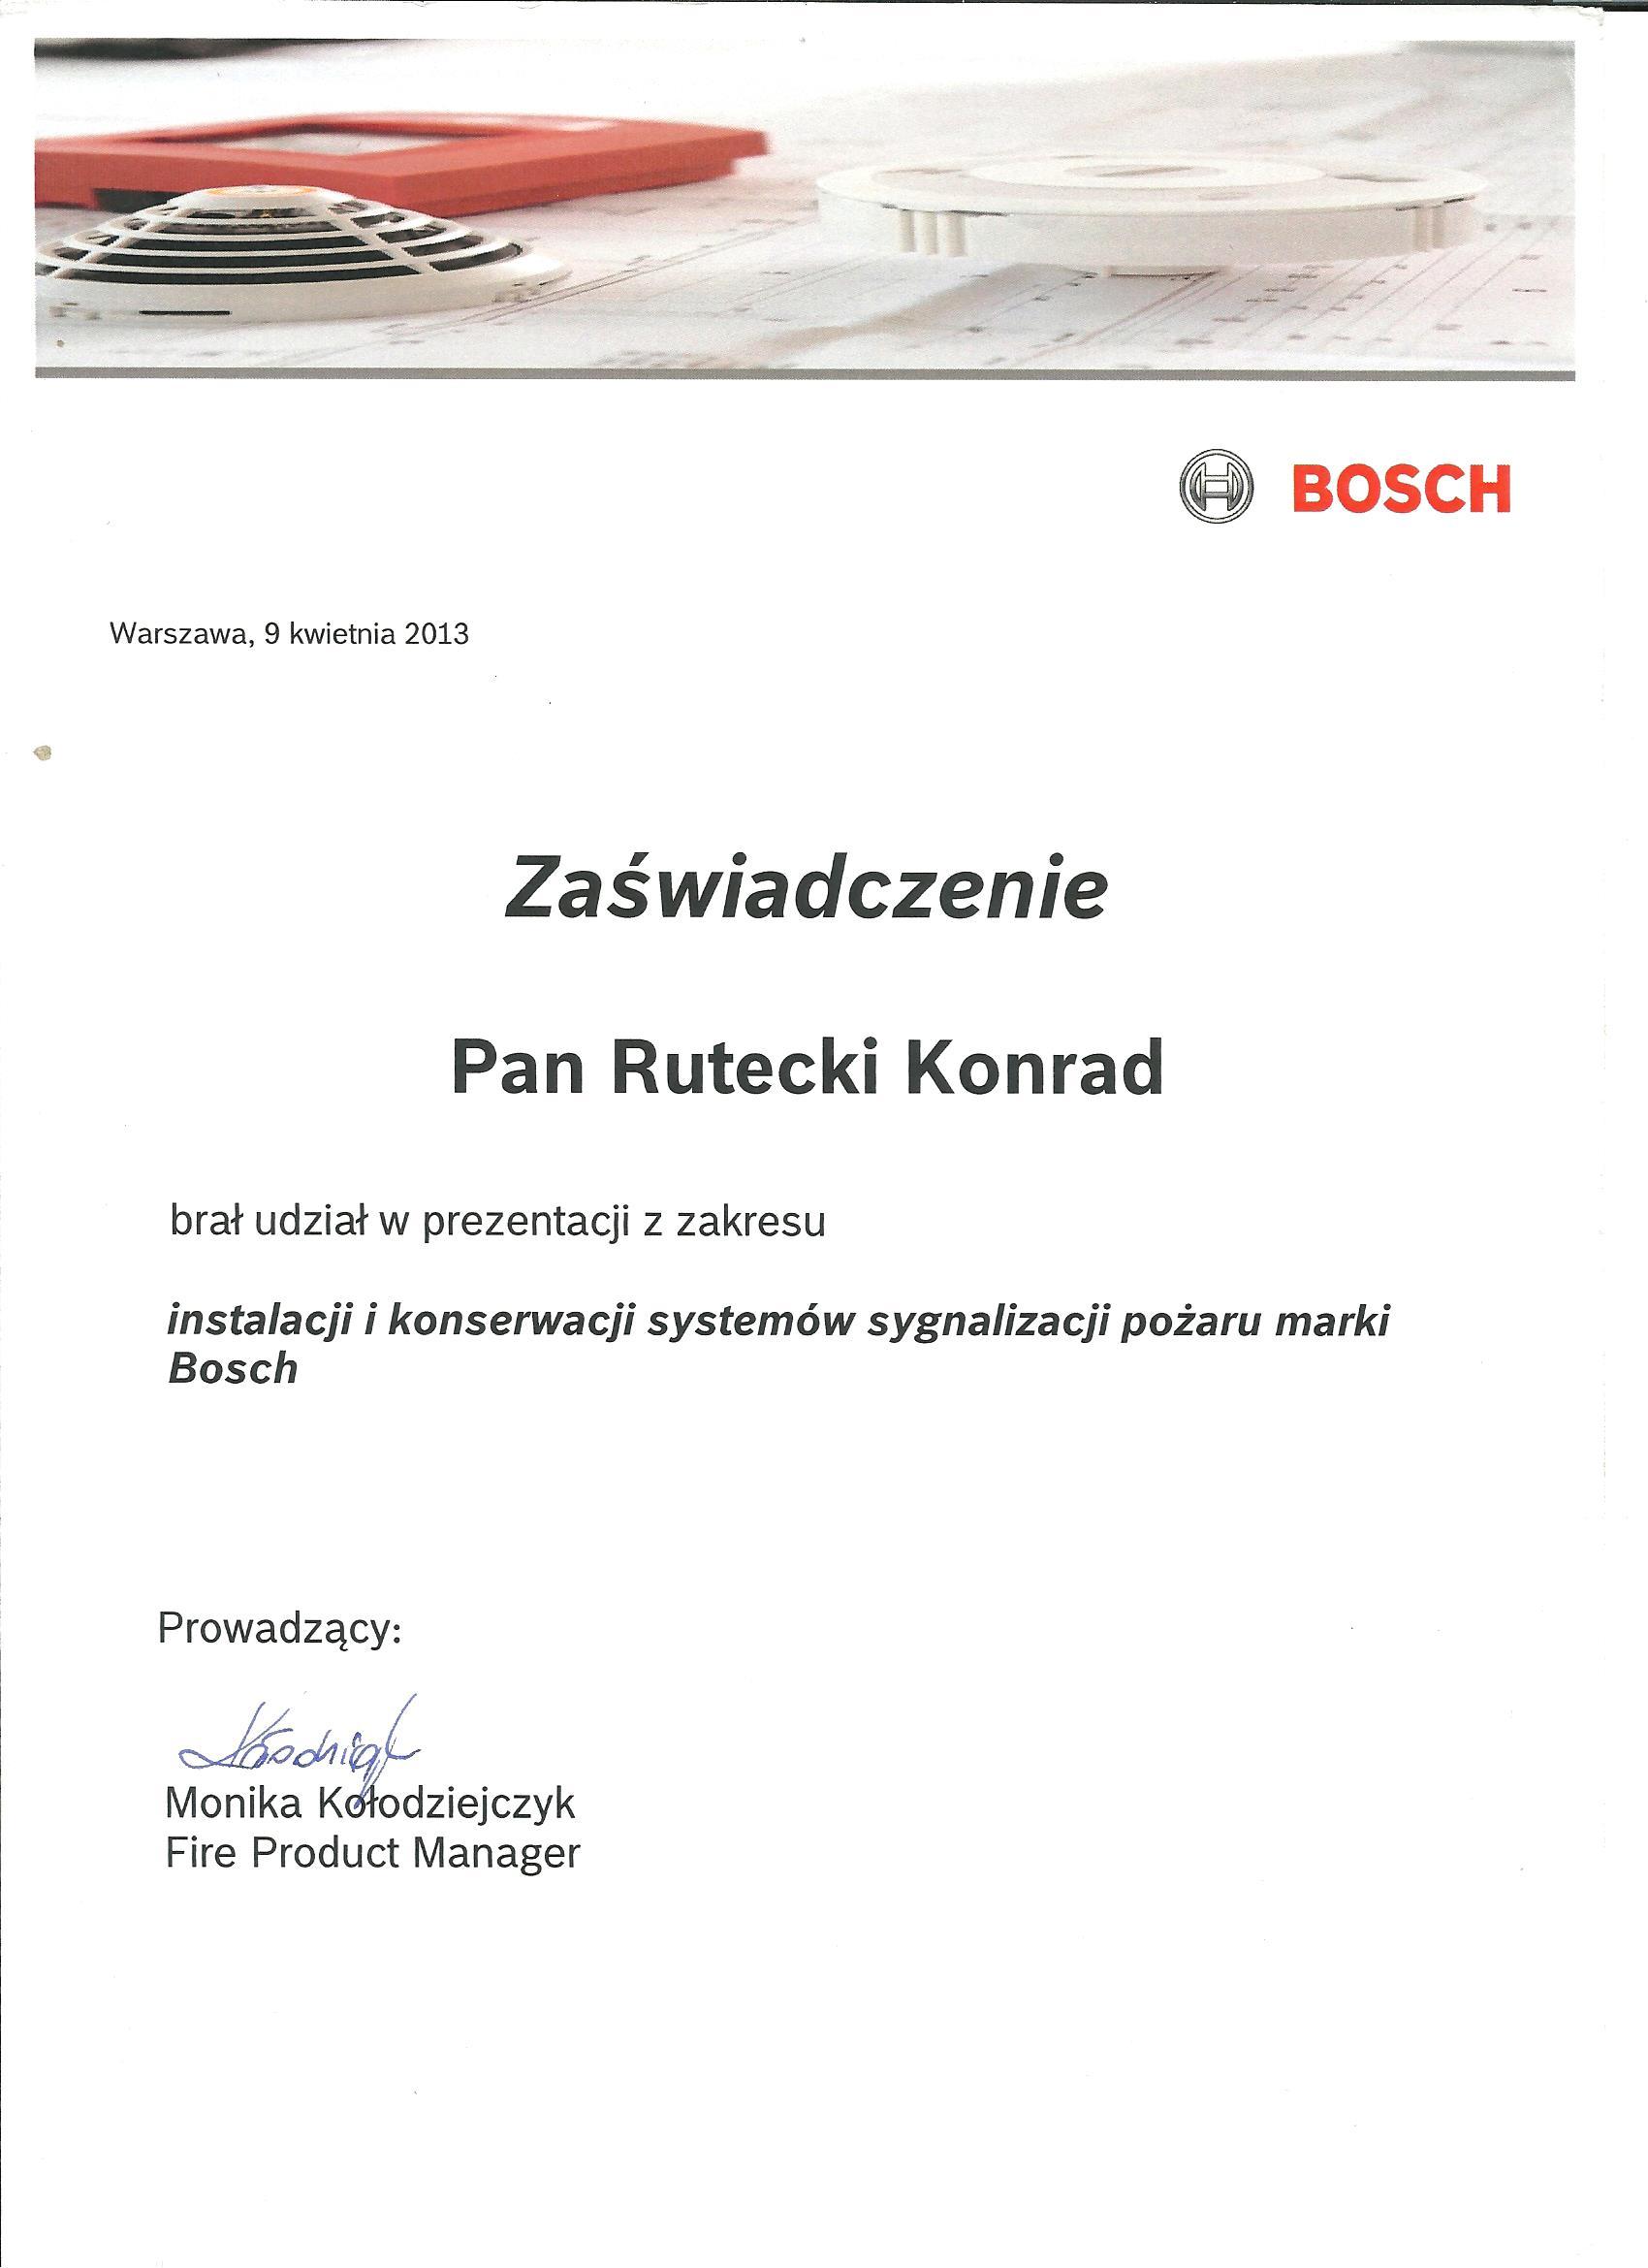 3.1 Certyfikat BOSH 001